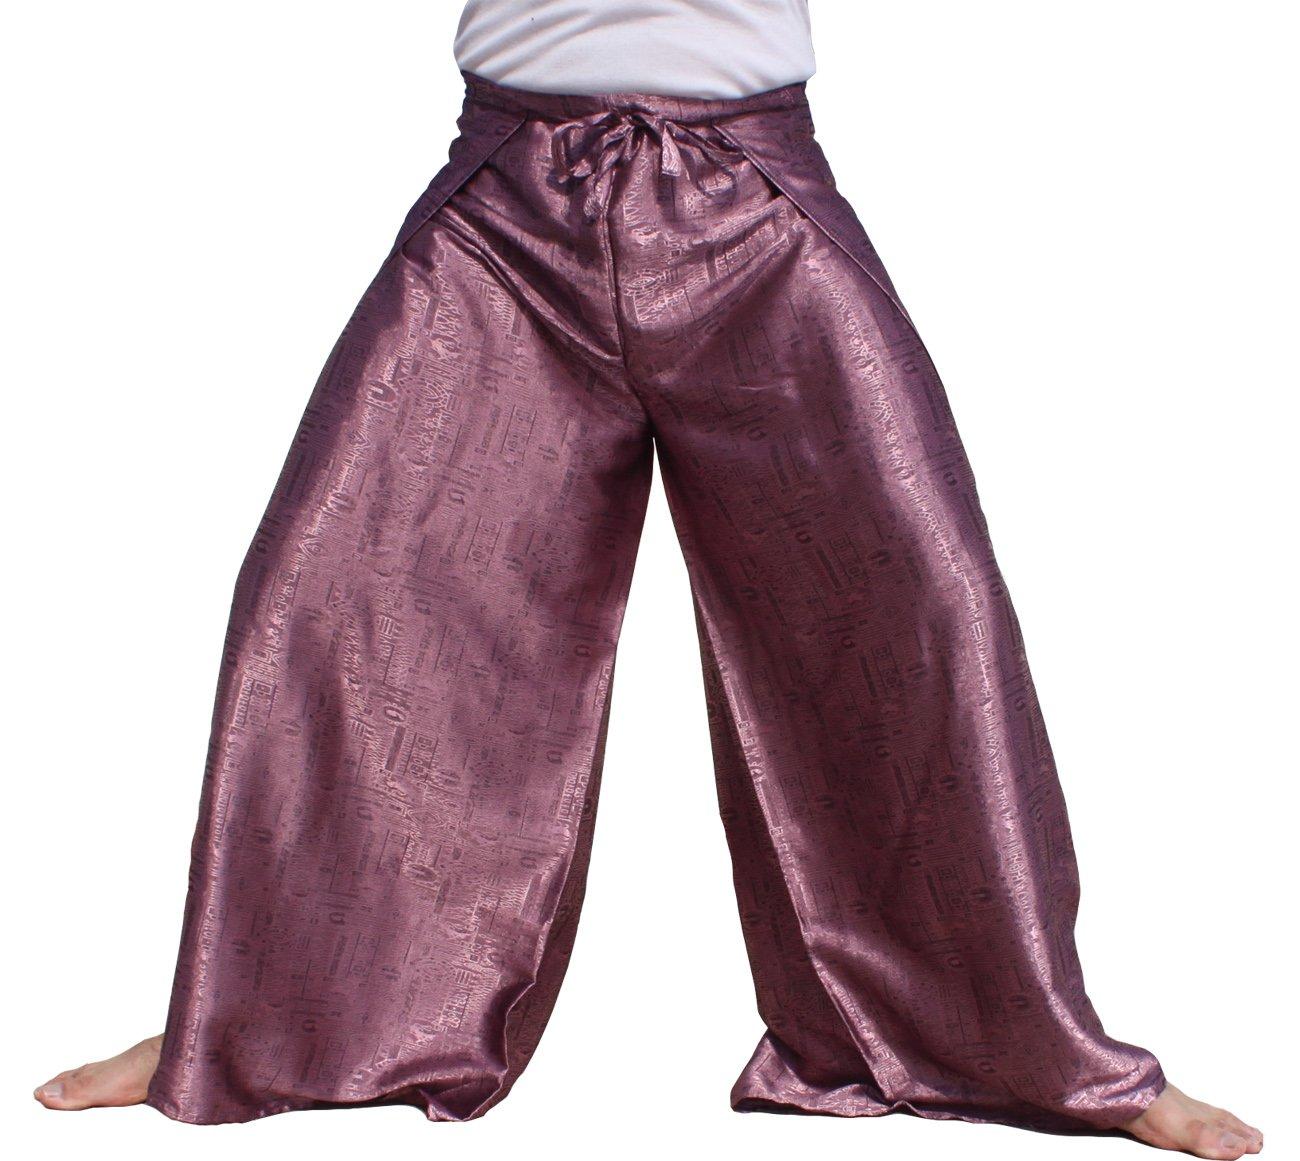 RaanPahMuang Brand Geometric Thick Textured Silk Drive In Wrap Pants, Medium, Pink by RaanPahMuang